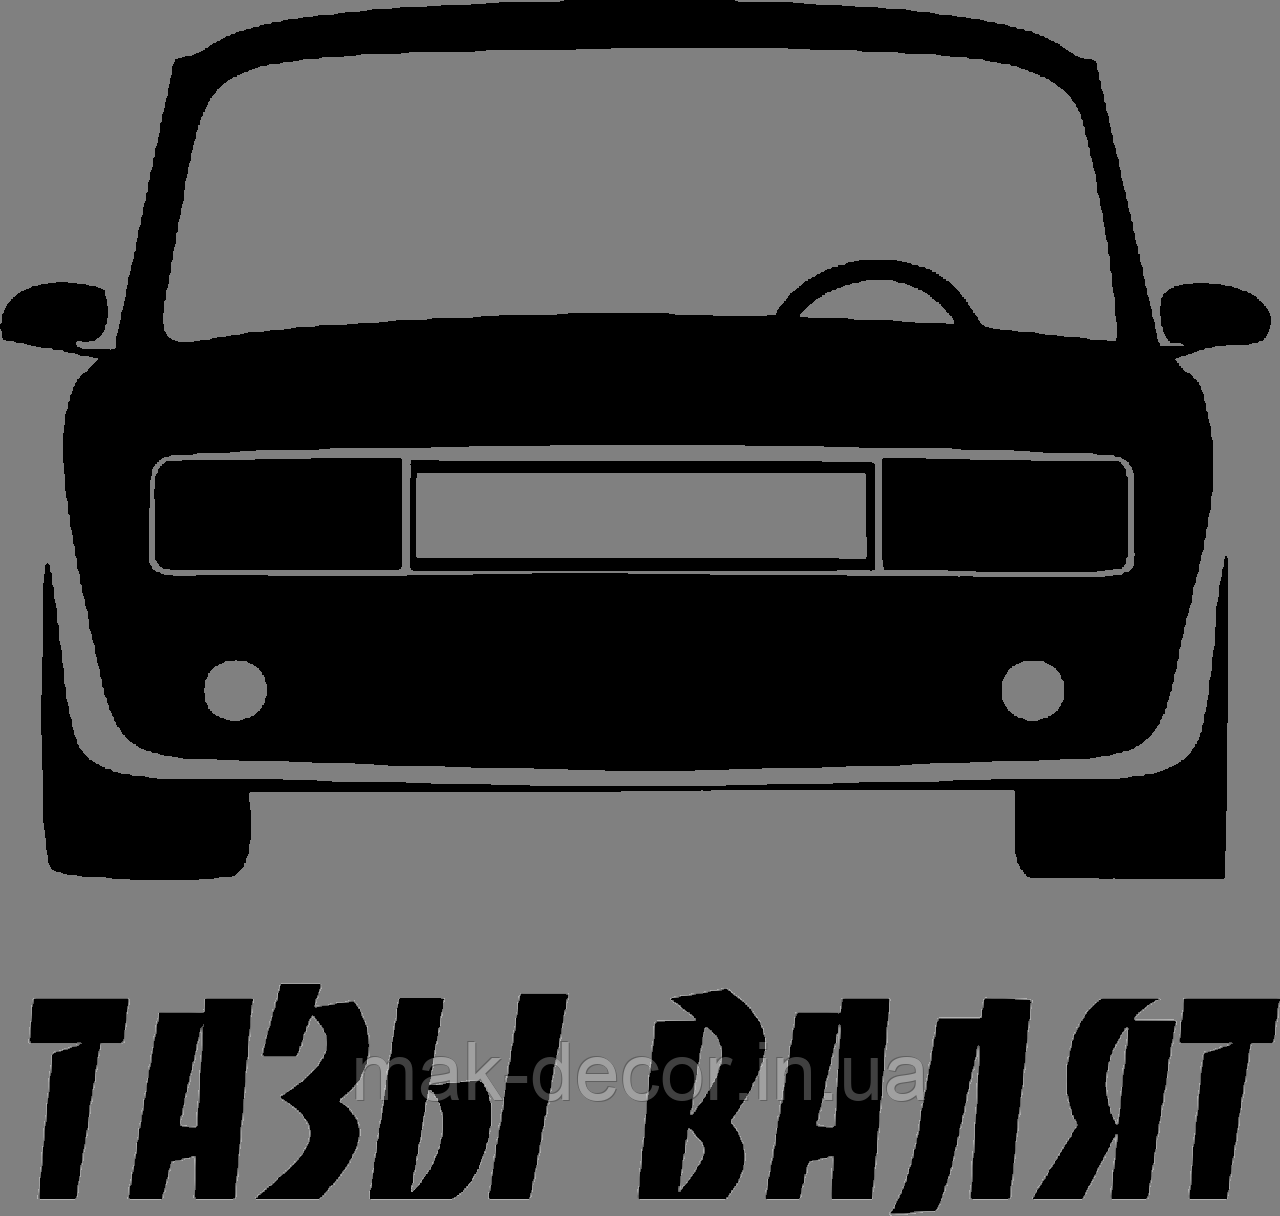 Виниловая наклейка на авто Тазы валят 2106 (цена за размер 14х15 см)